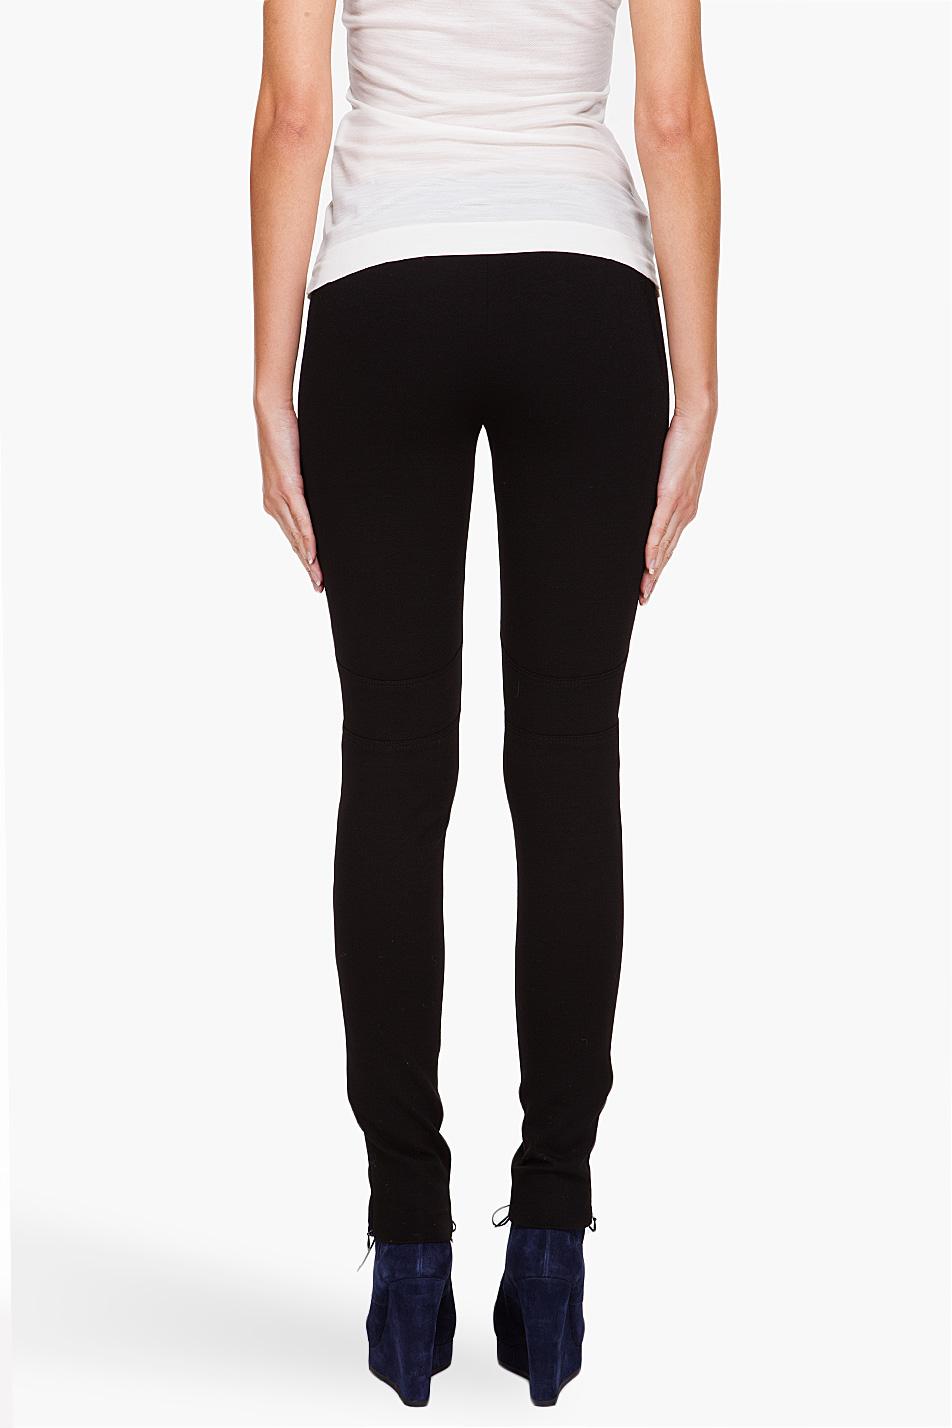 7a04995013985 Moncler Leggings in Black - Lyst